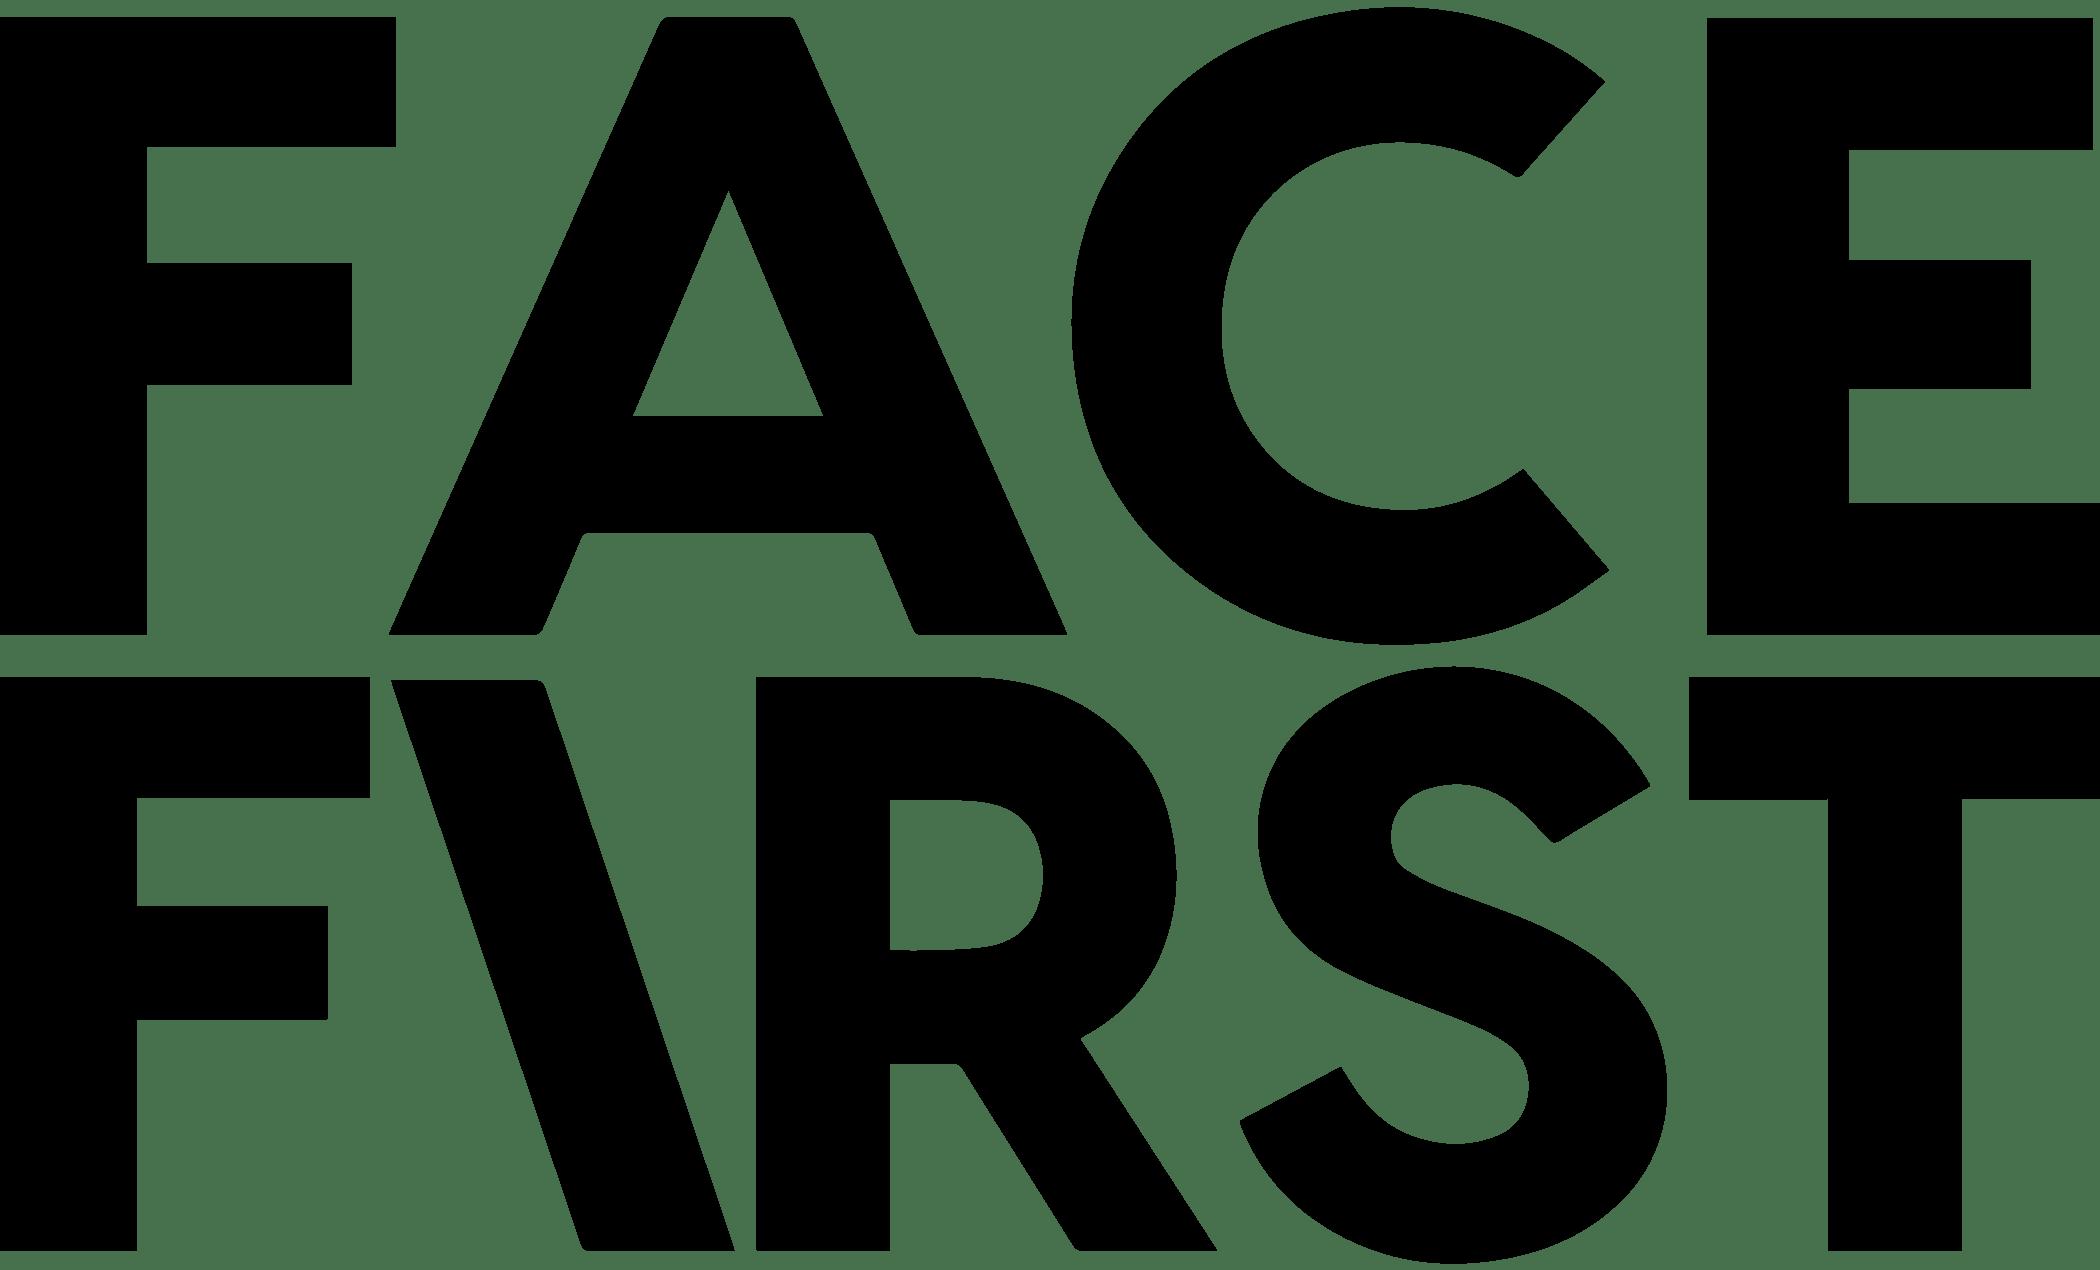 logo_2018_black.png